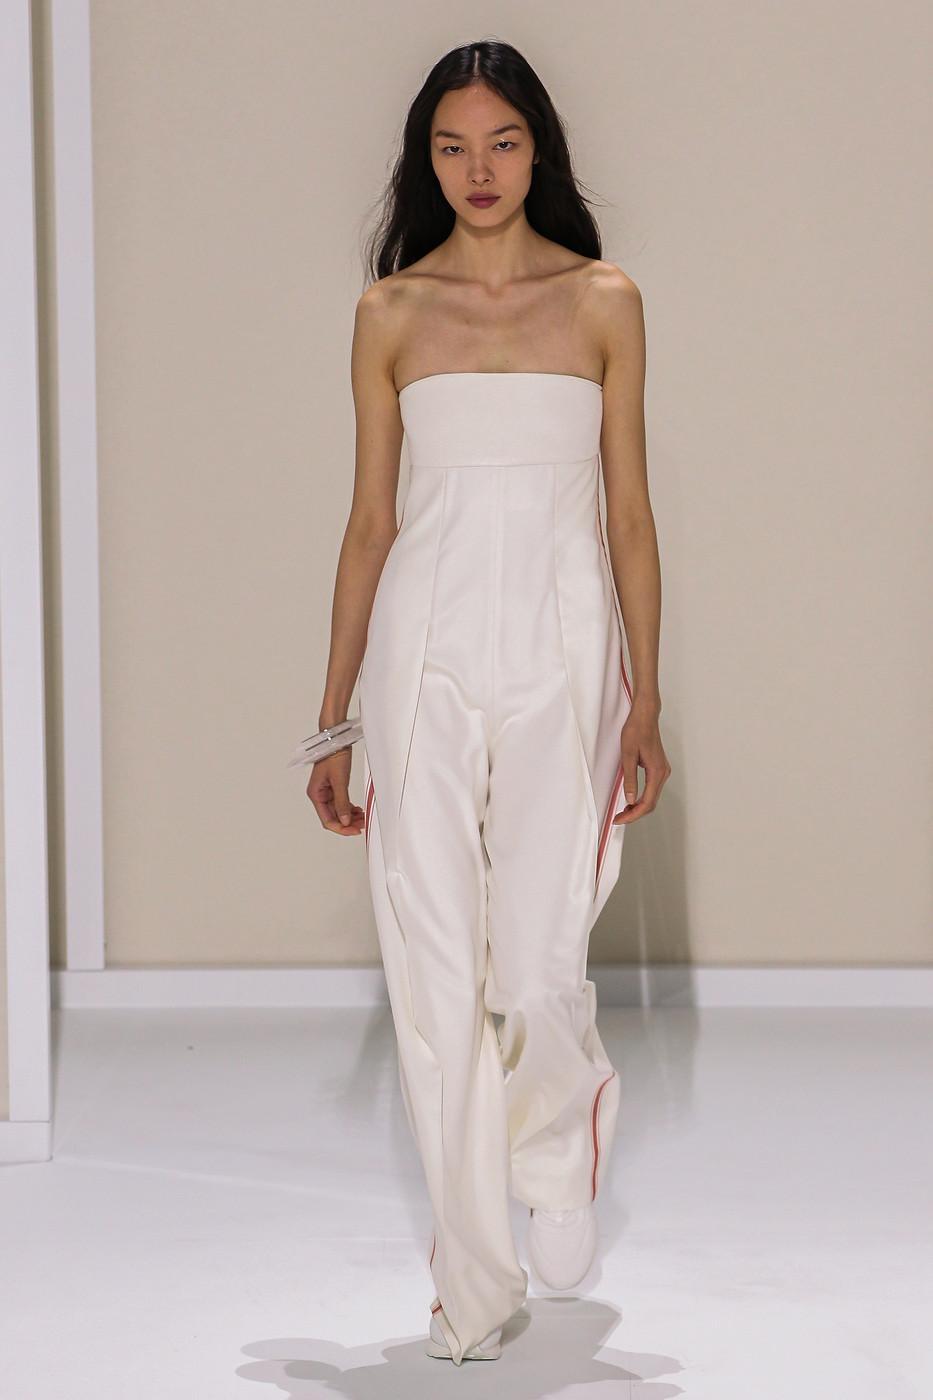 Asian catwalk model, hot toonsex